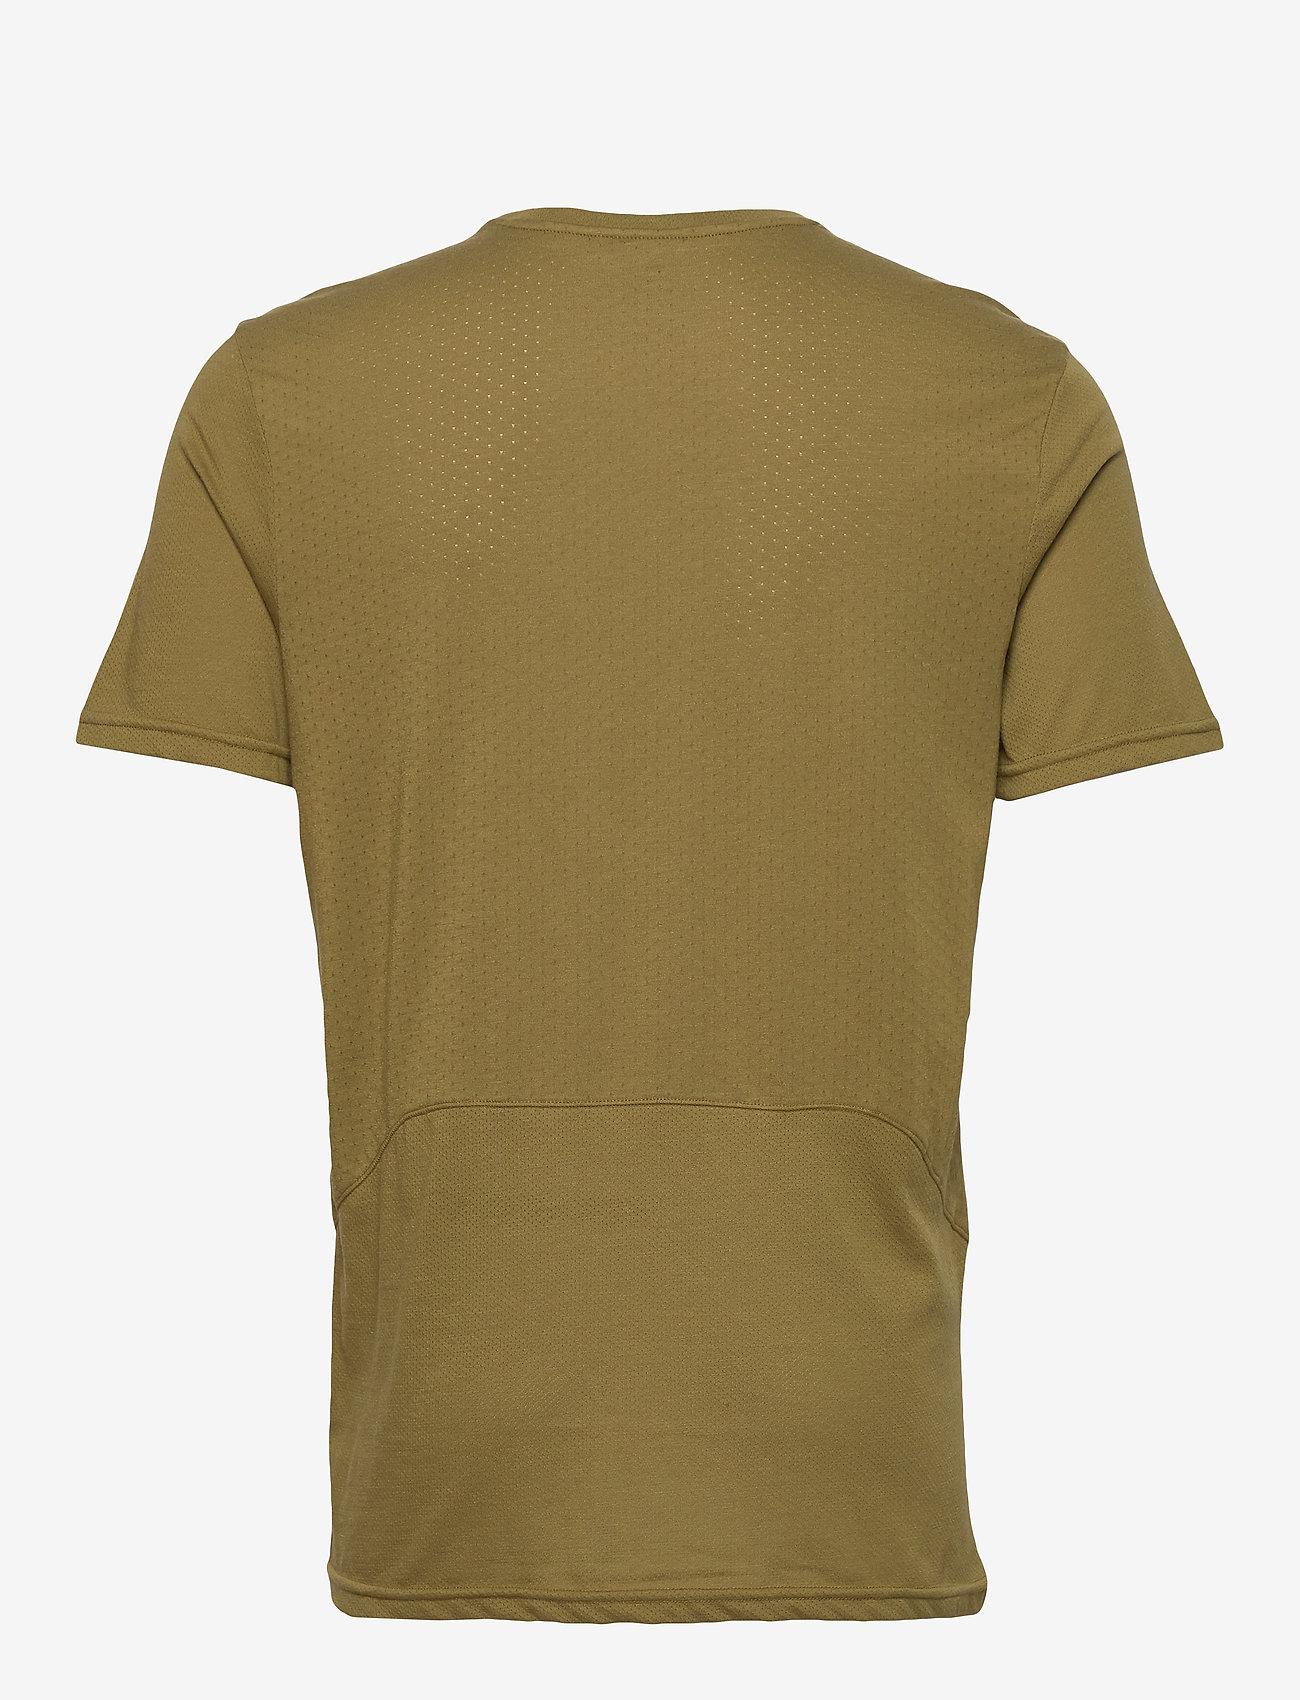 Men's Cotton/poly Tee (Moss Green) - Newline 3PLEzV